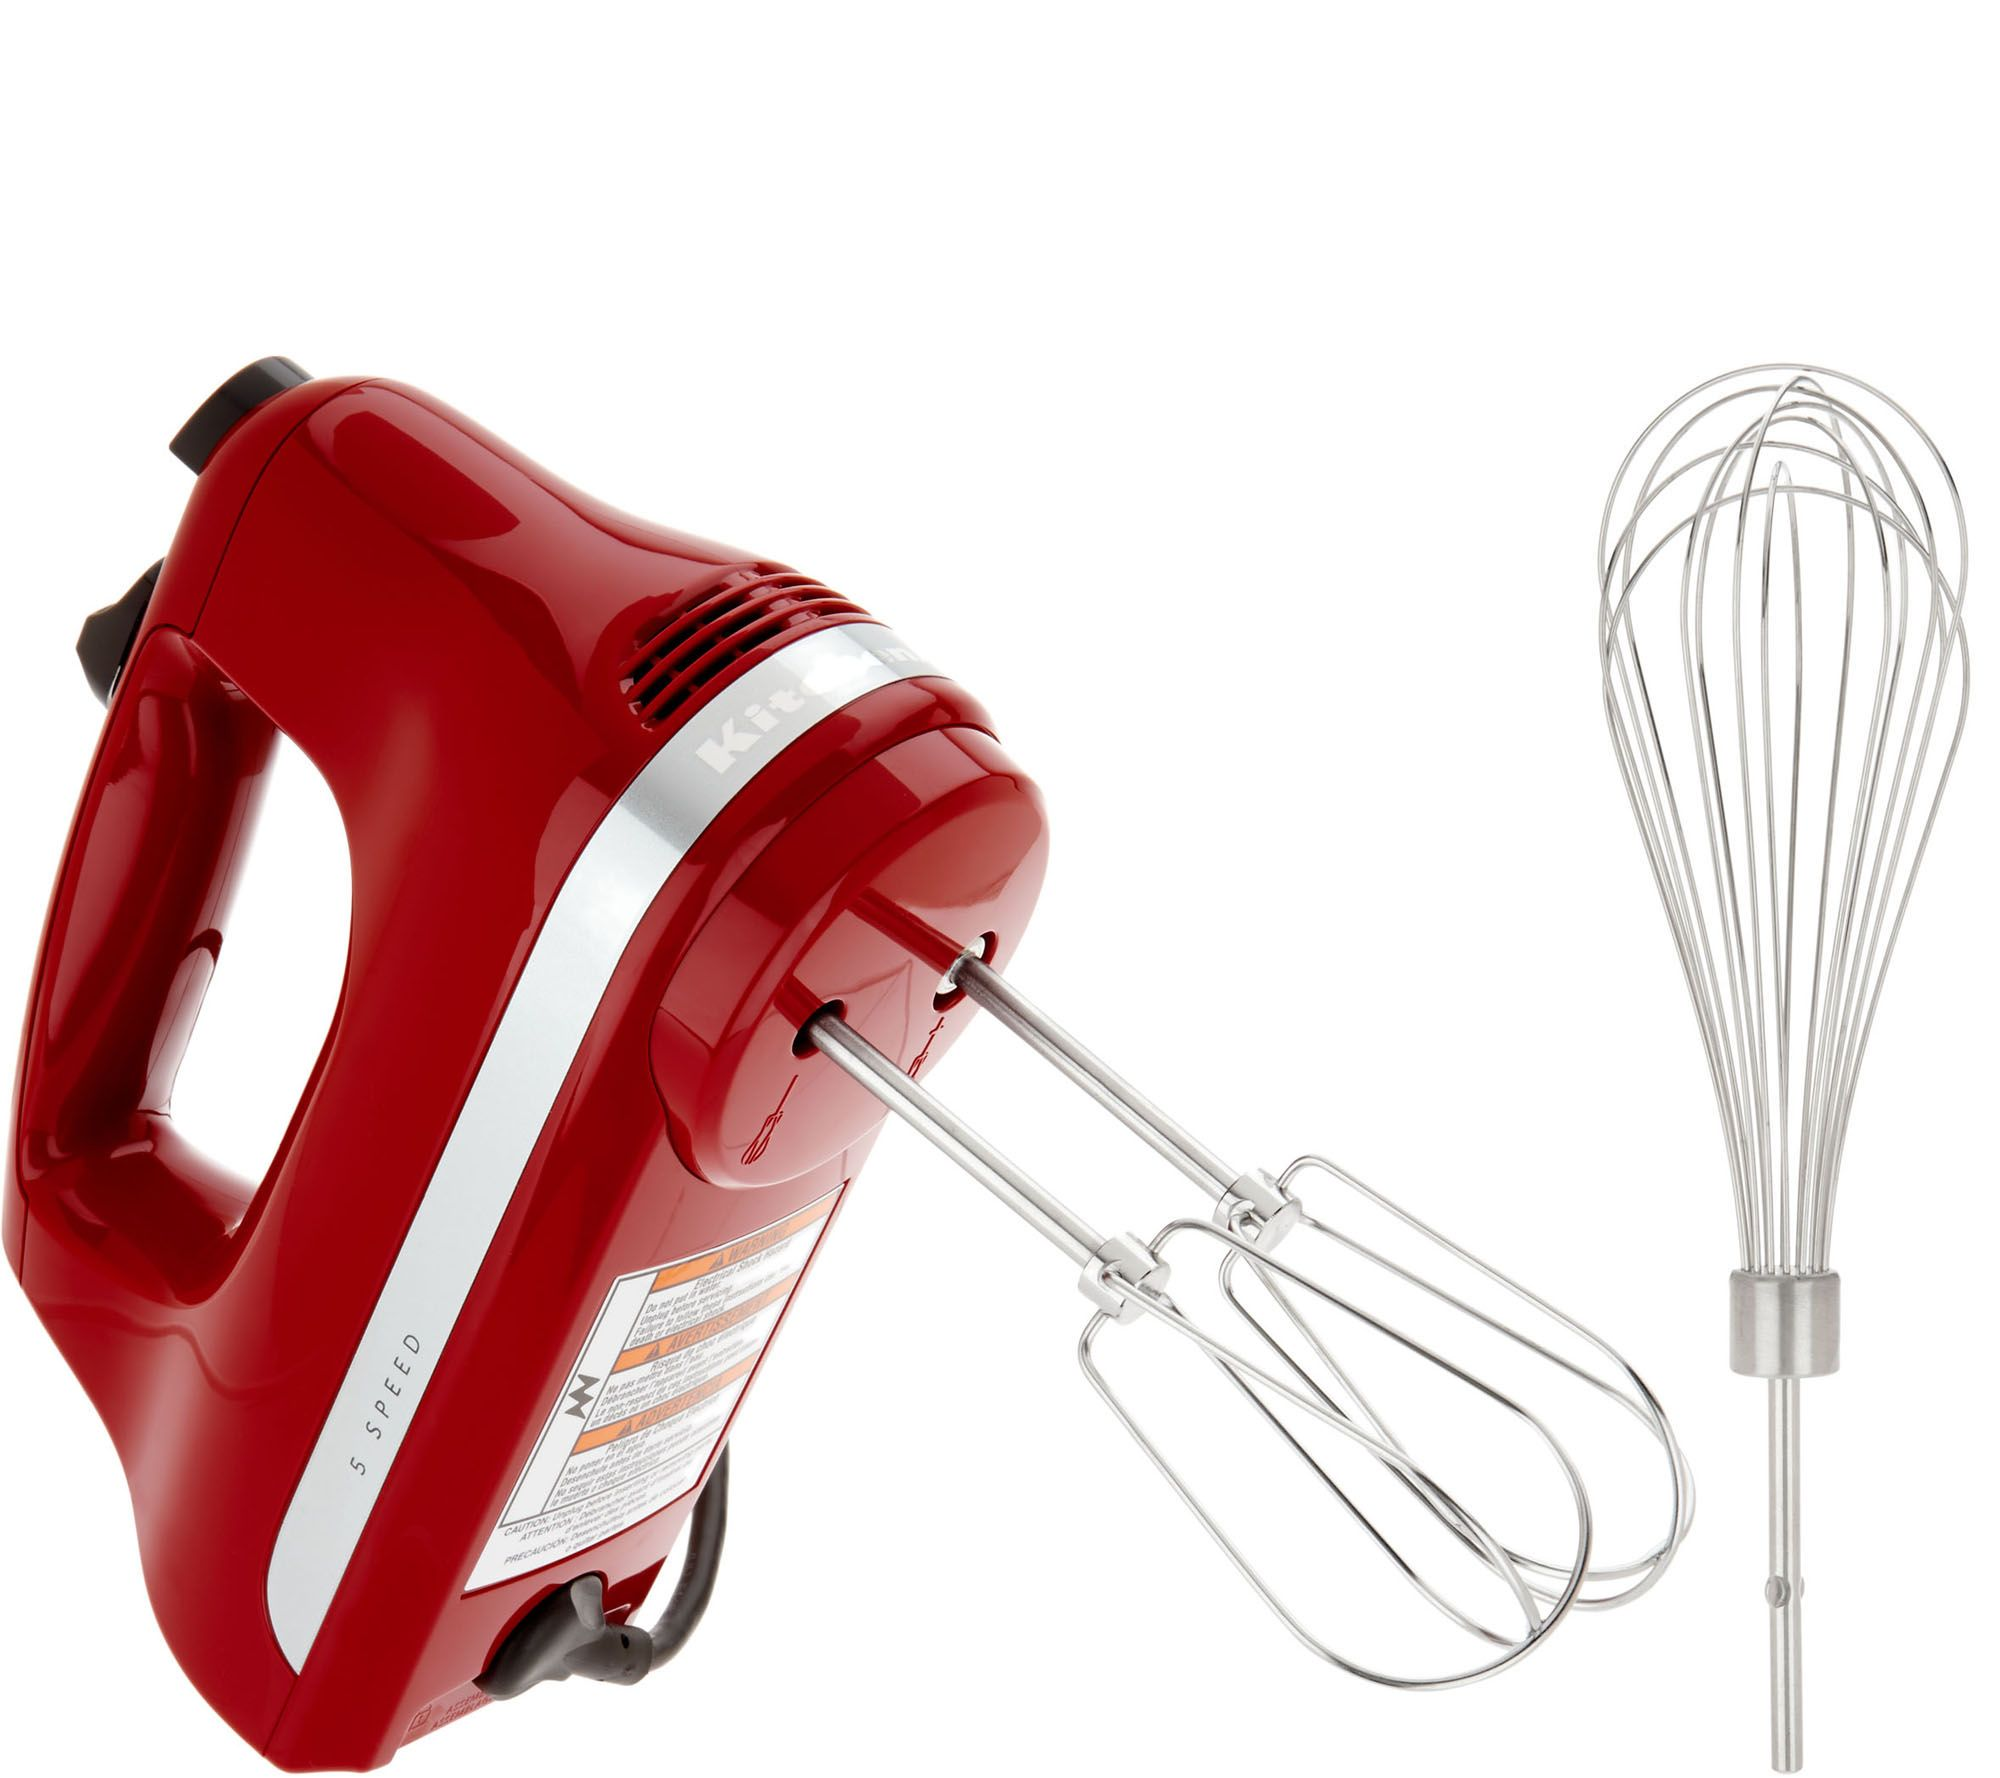 Kitchenaid Hand Mixer Beaters Set Of 2 Besto Blog